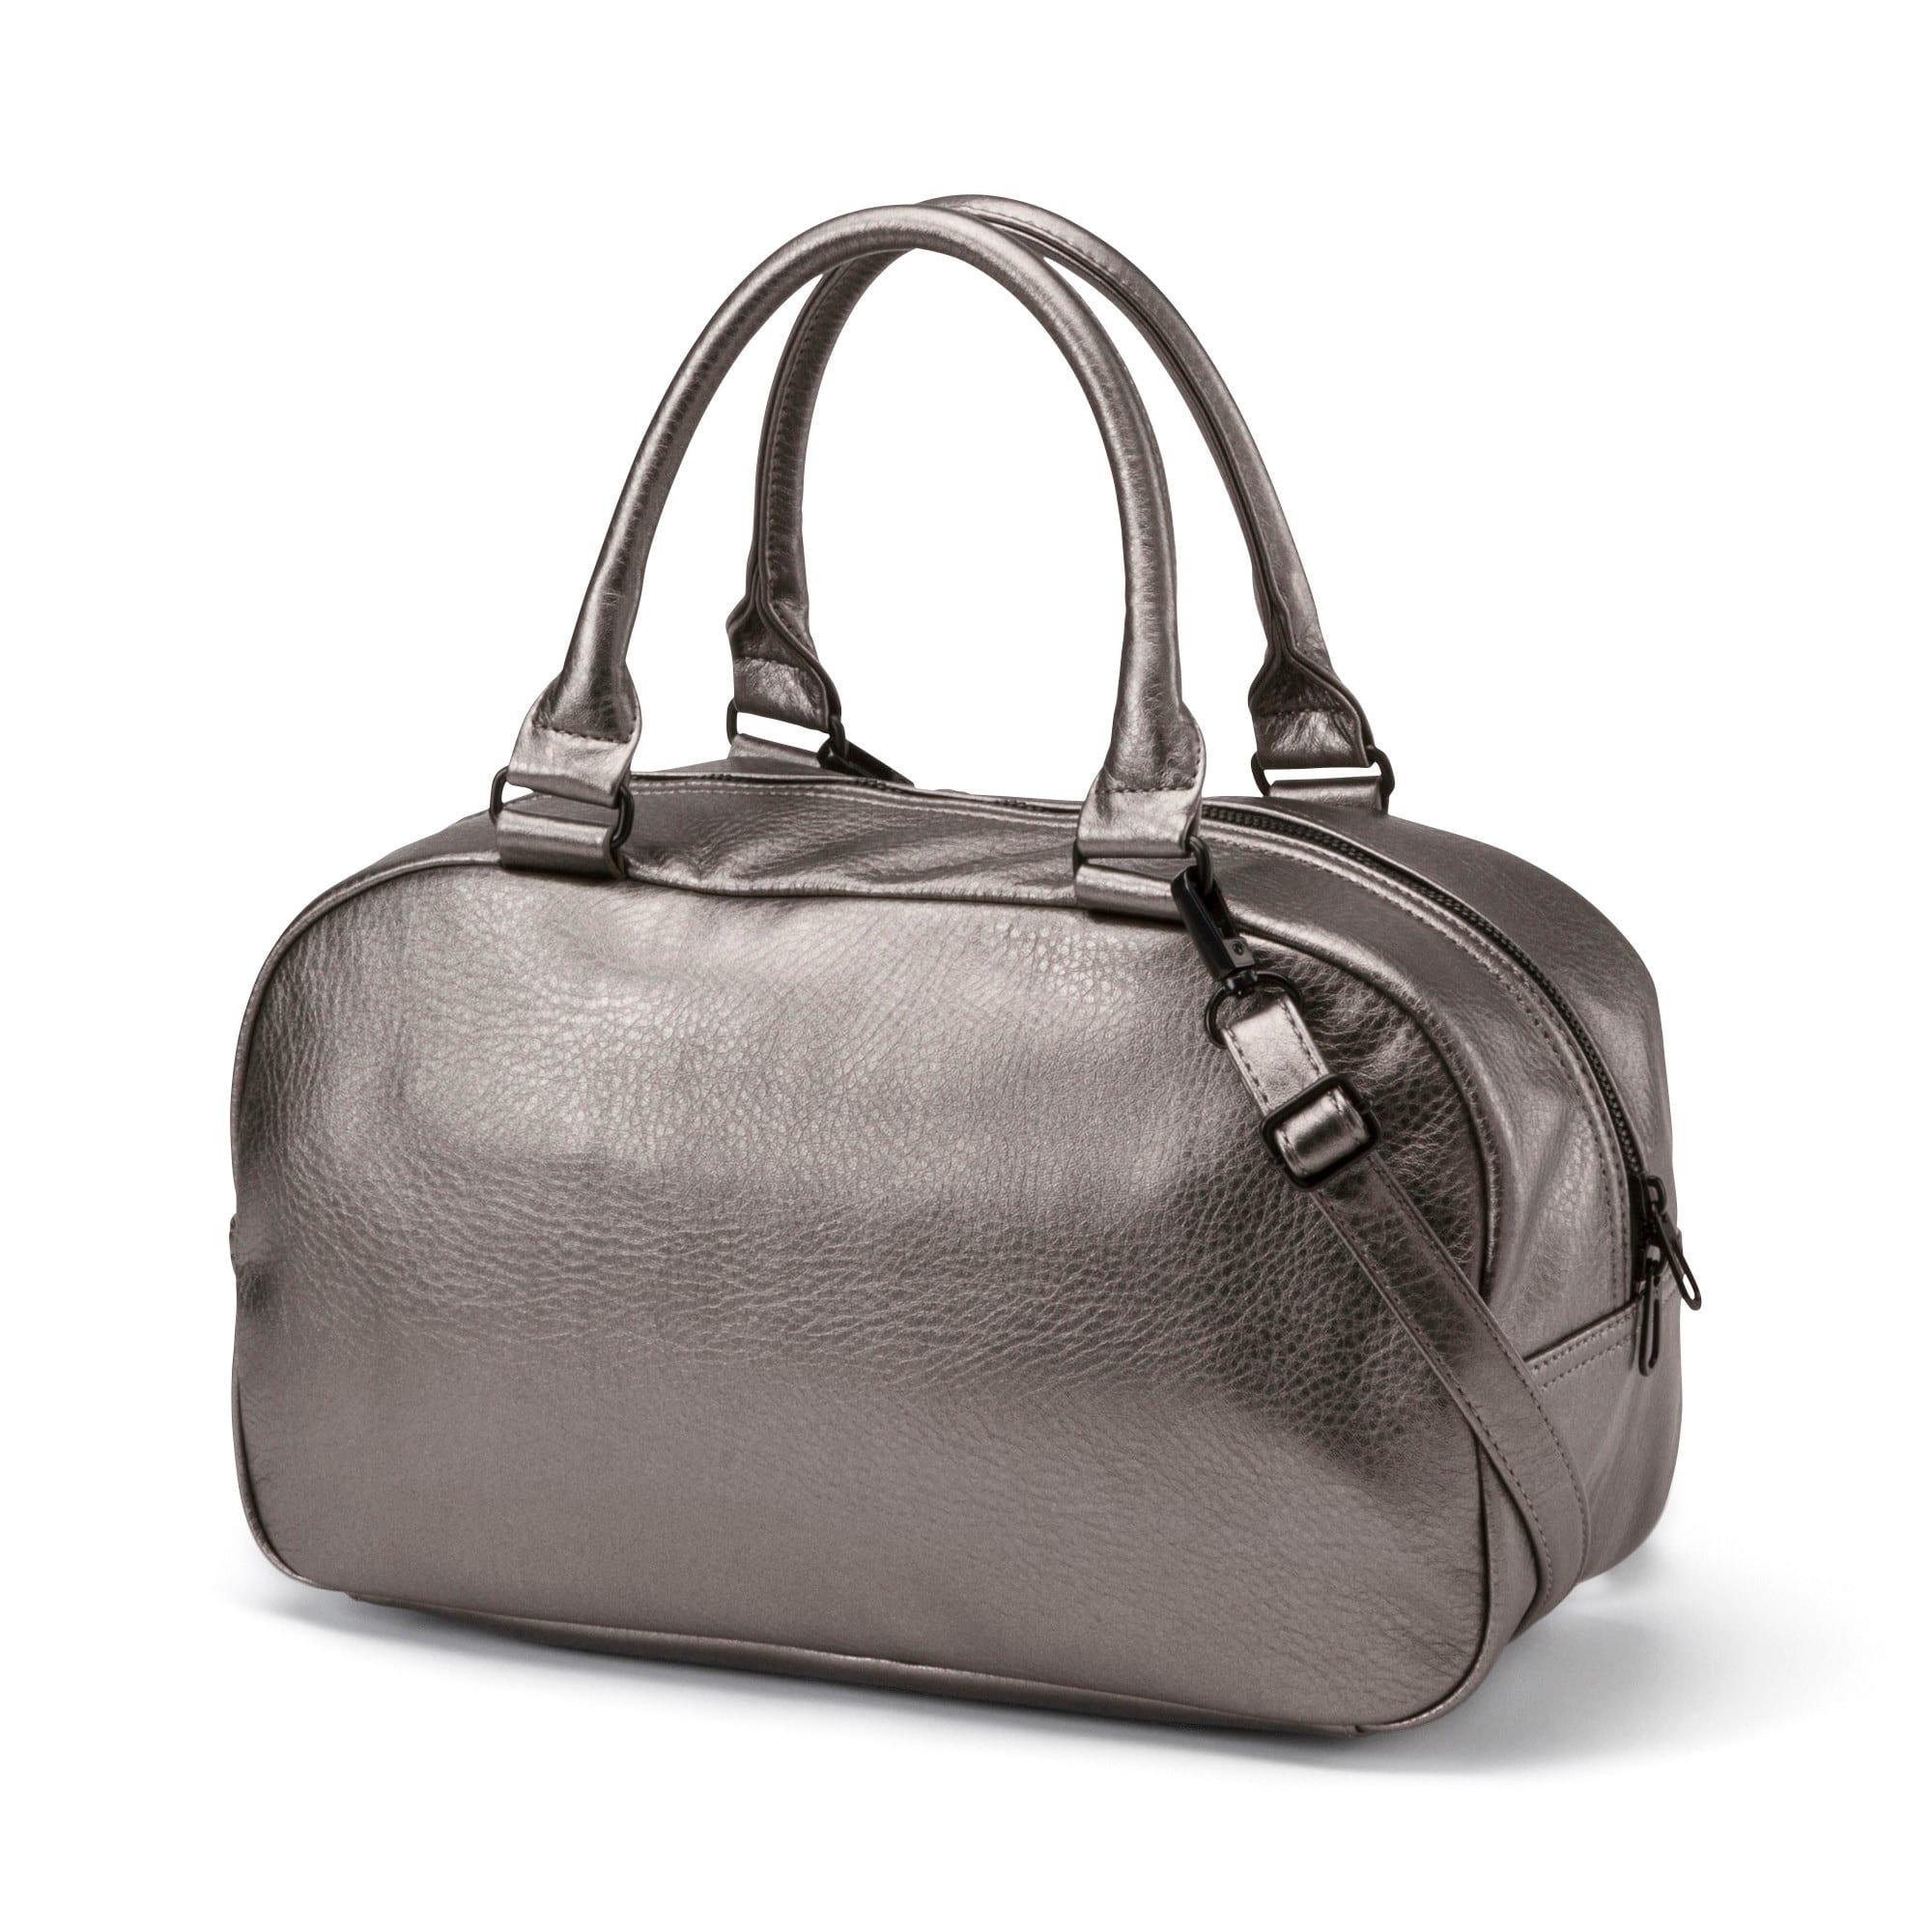 Thumbnail 2 of SF LS Handbag Metallic Ash, Metallic Ash, medium-IND